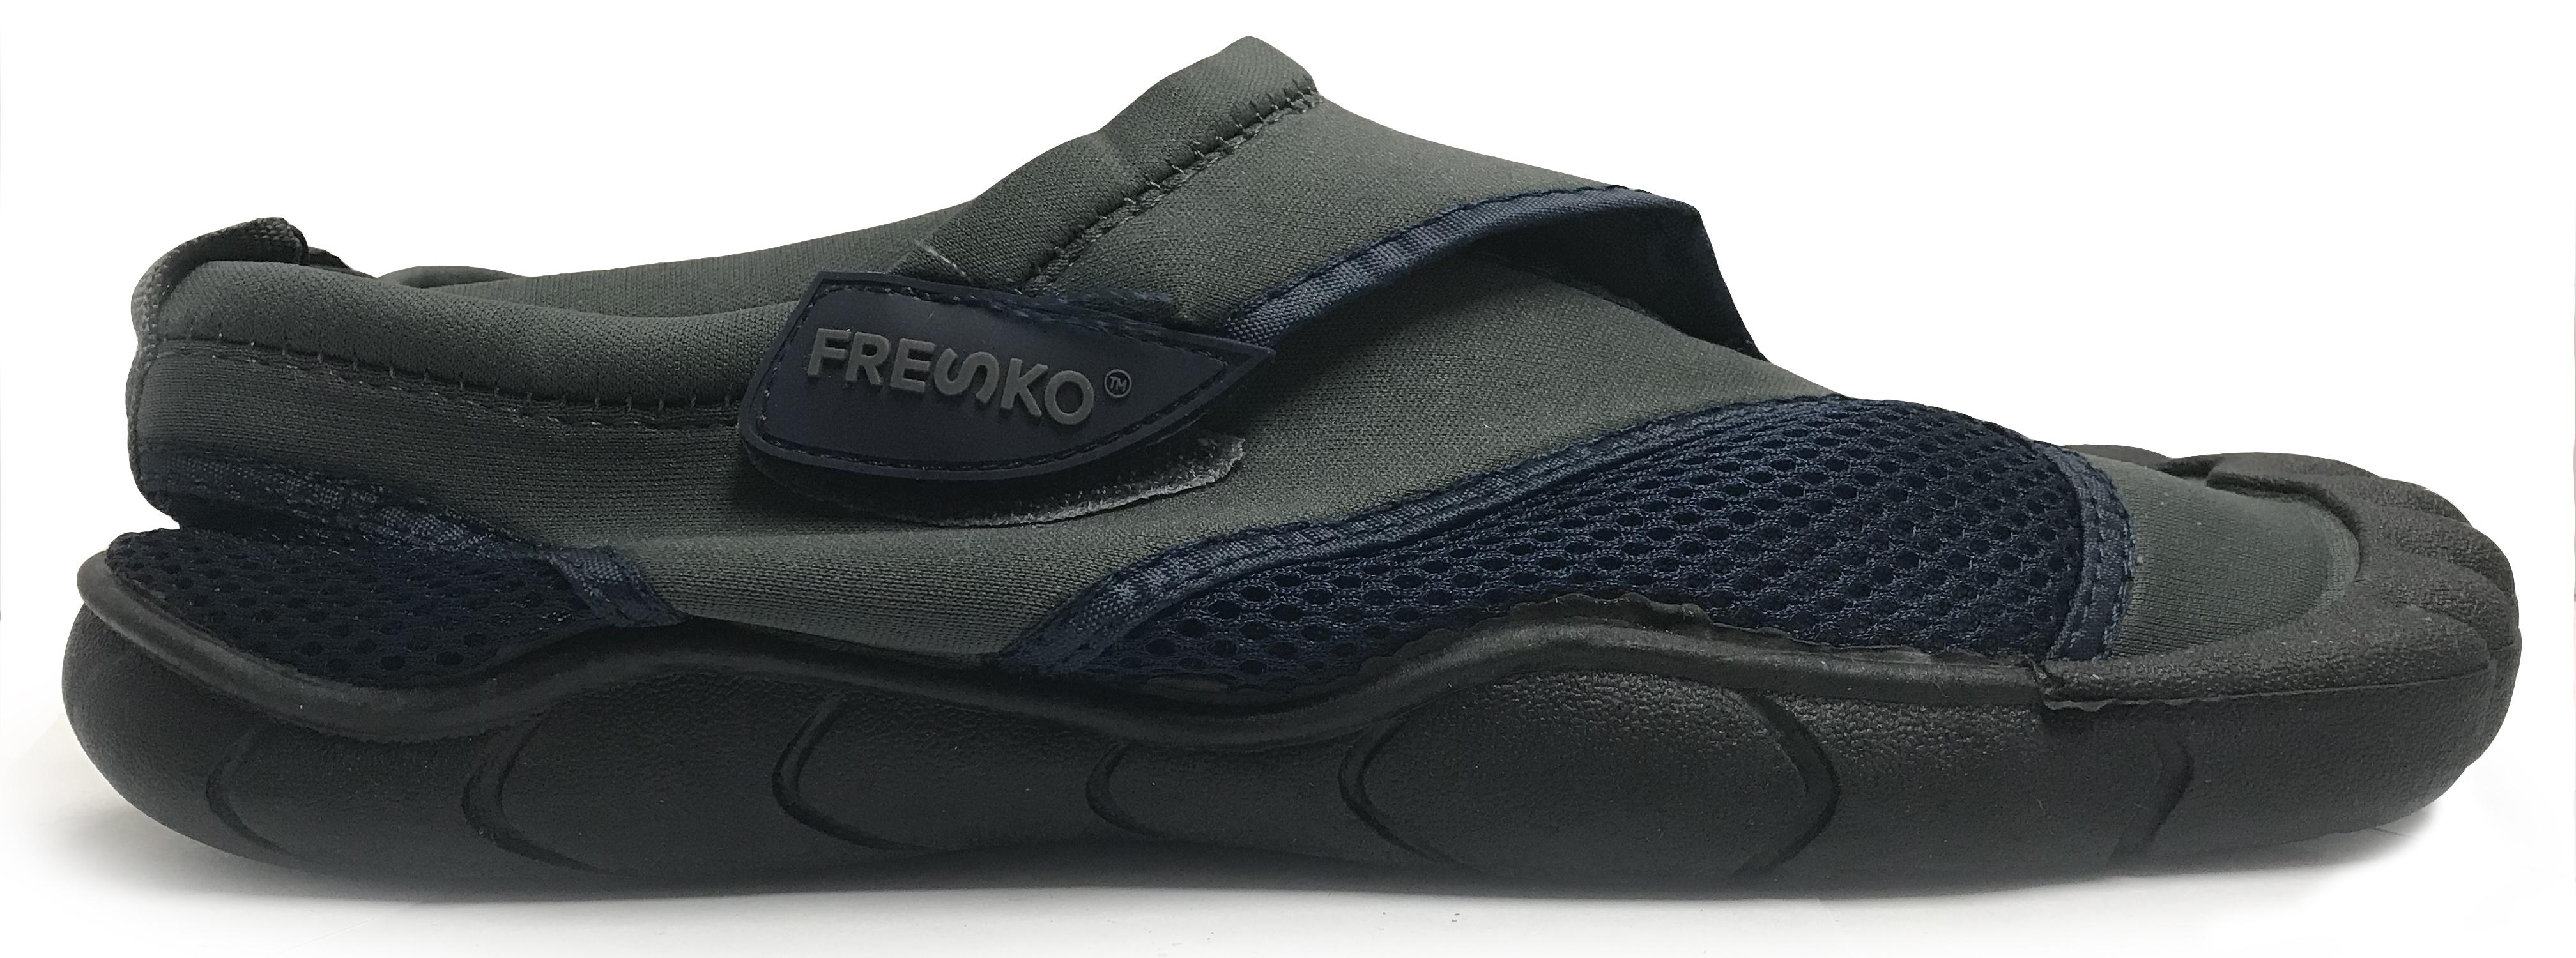 ebe0e90680c Fresko Men's Slip on Aqua Water Shoes with Toes | eBay